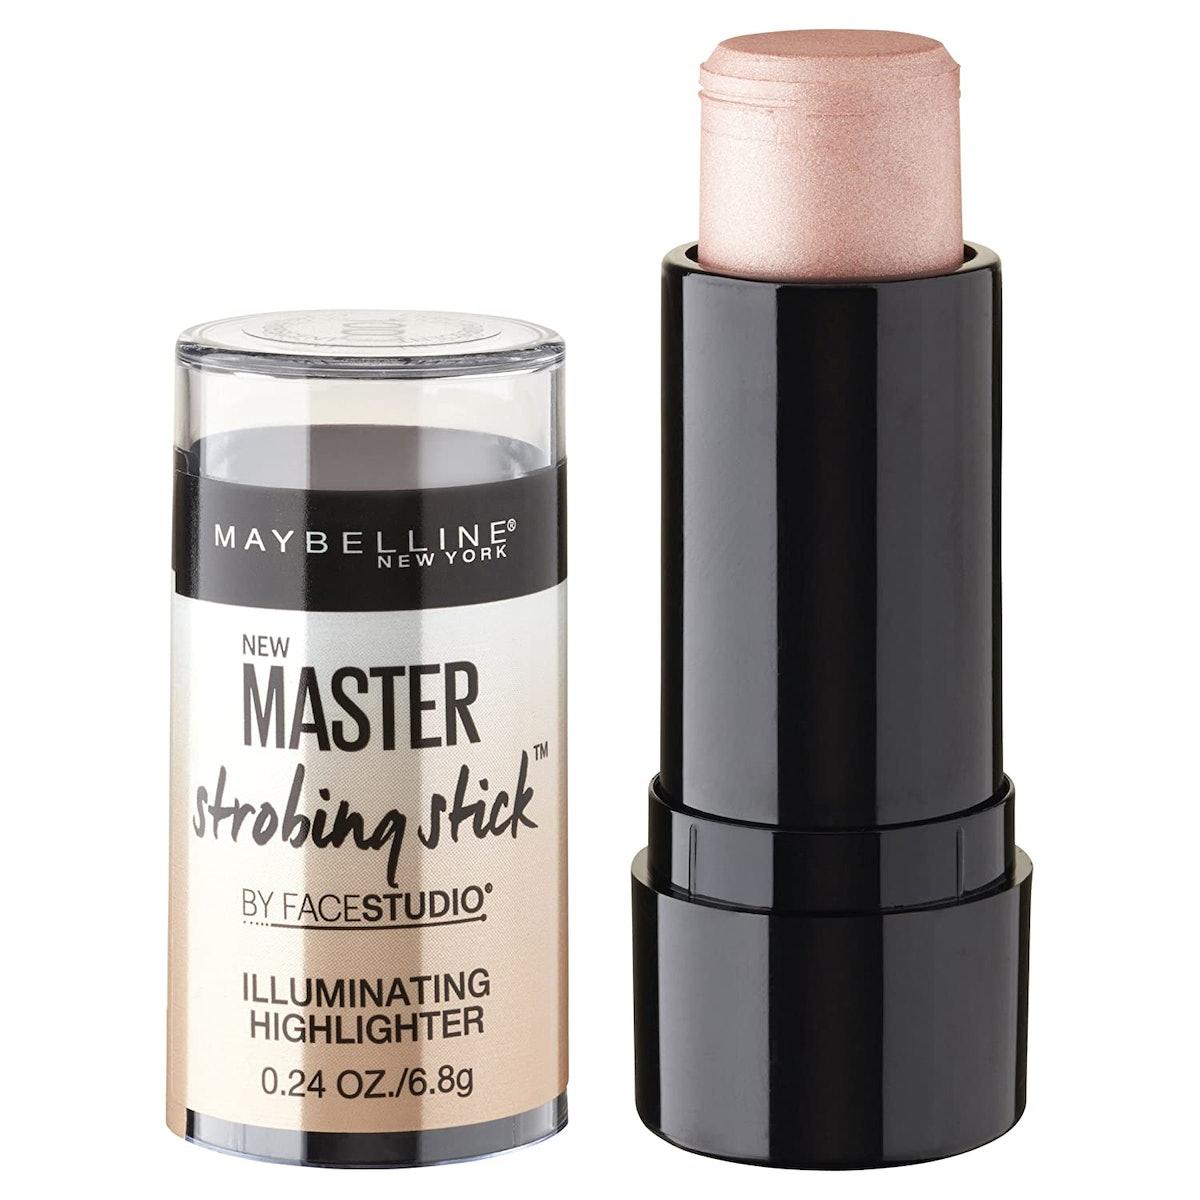 Maybelline FaceStudio Master Strobing Stick in Light Iridescent